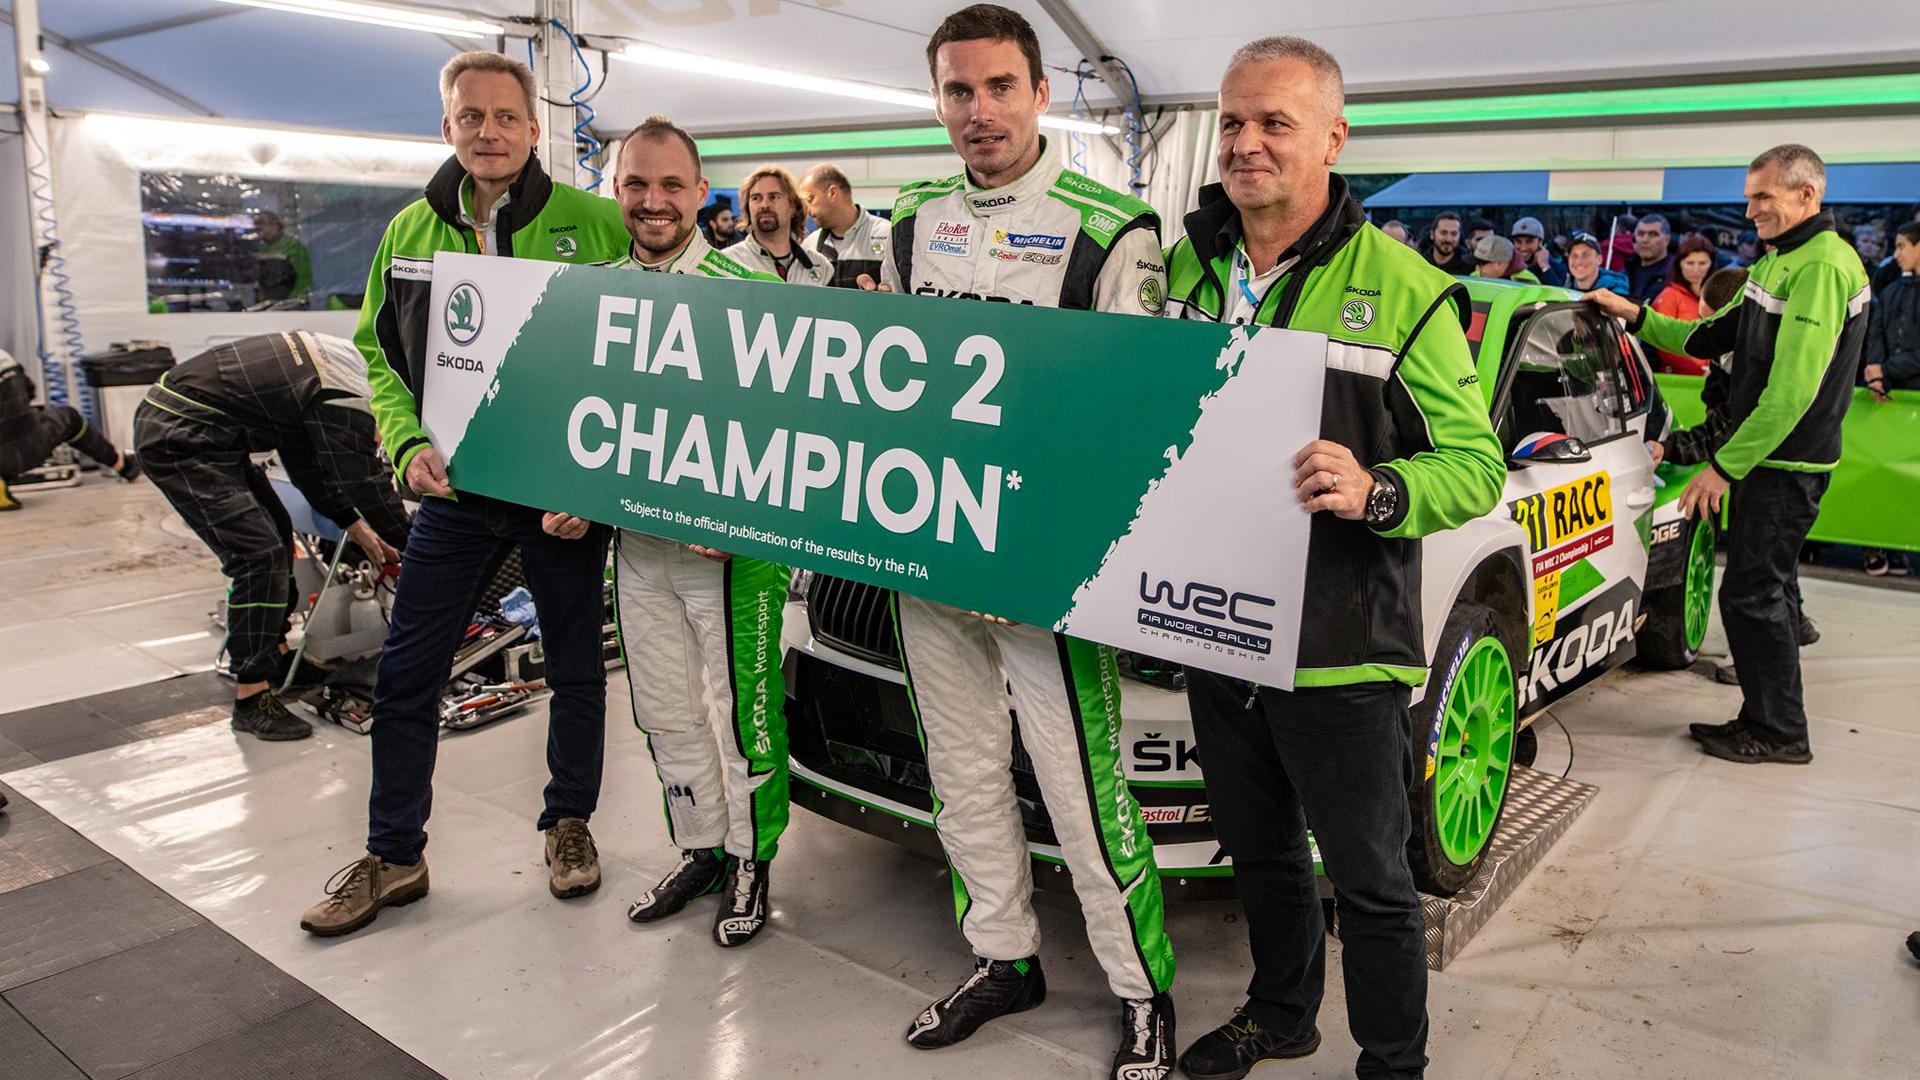 WRC2 - Skoda gets